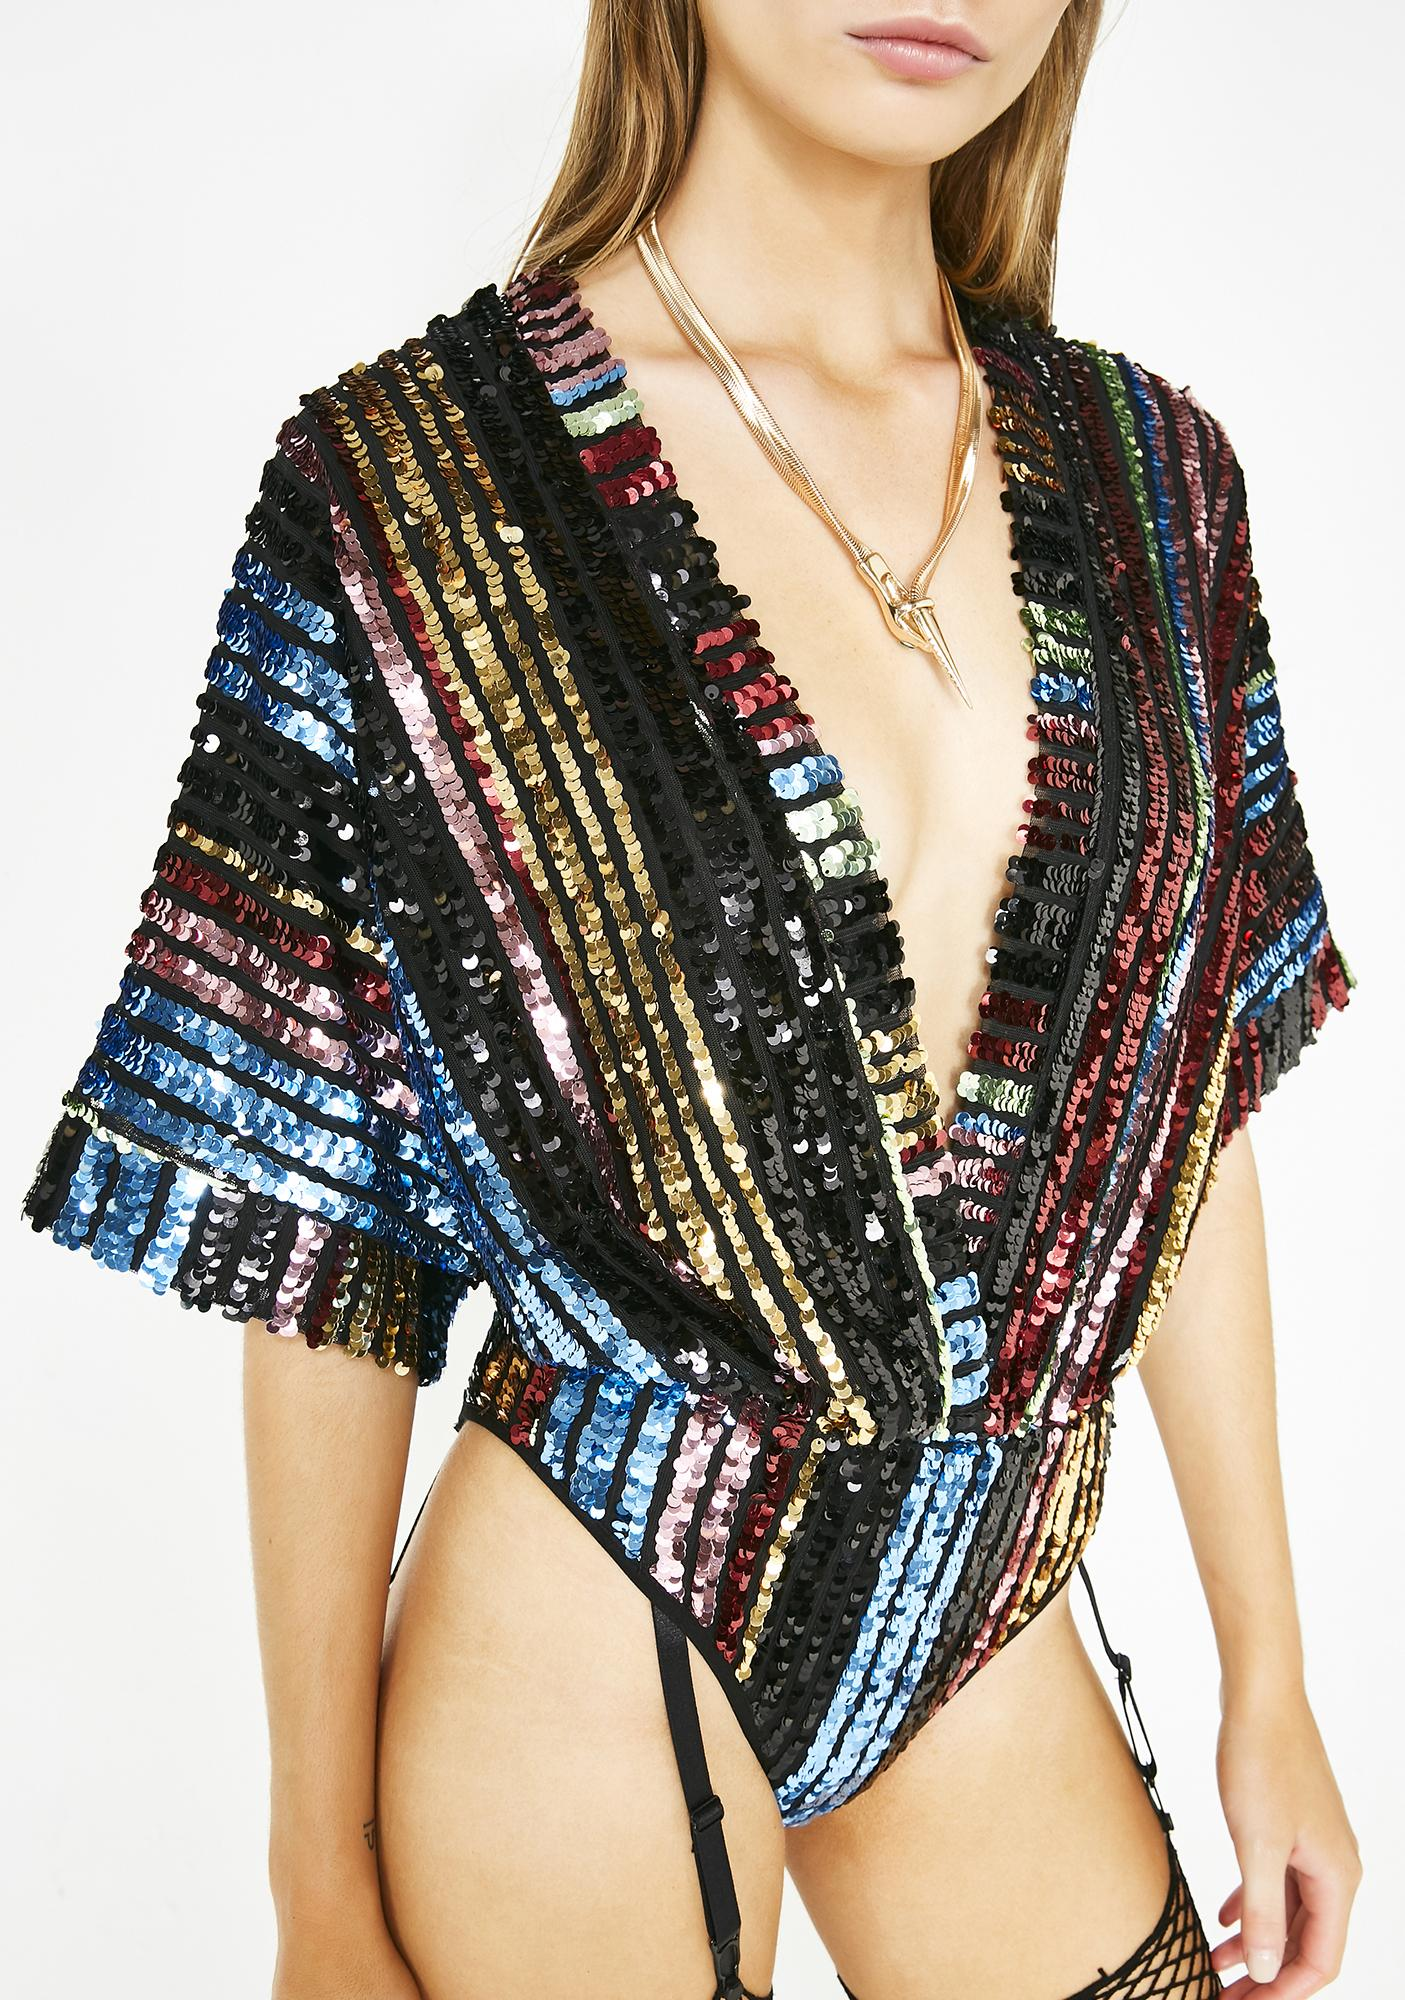 Club Exx Nova Crystallis Sequin Bodysuit